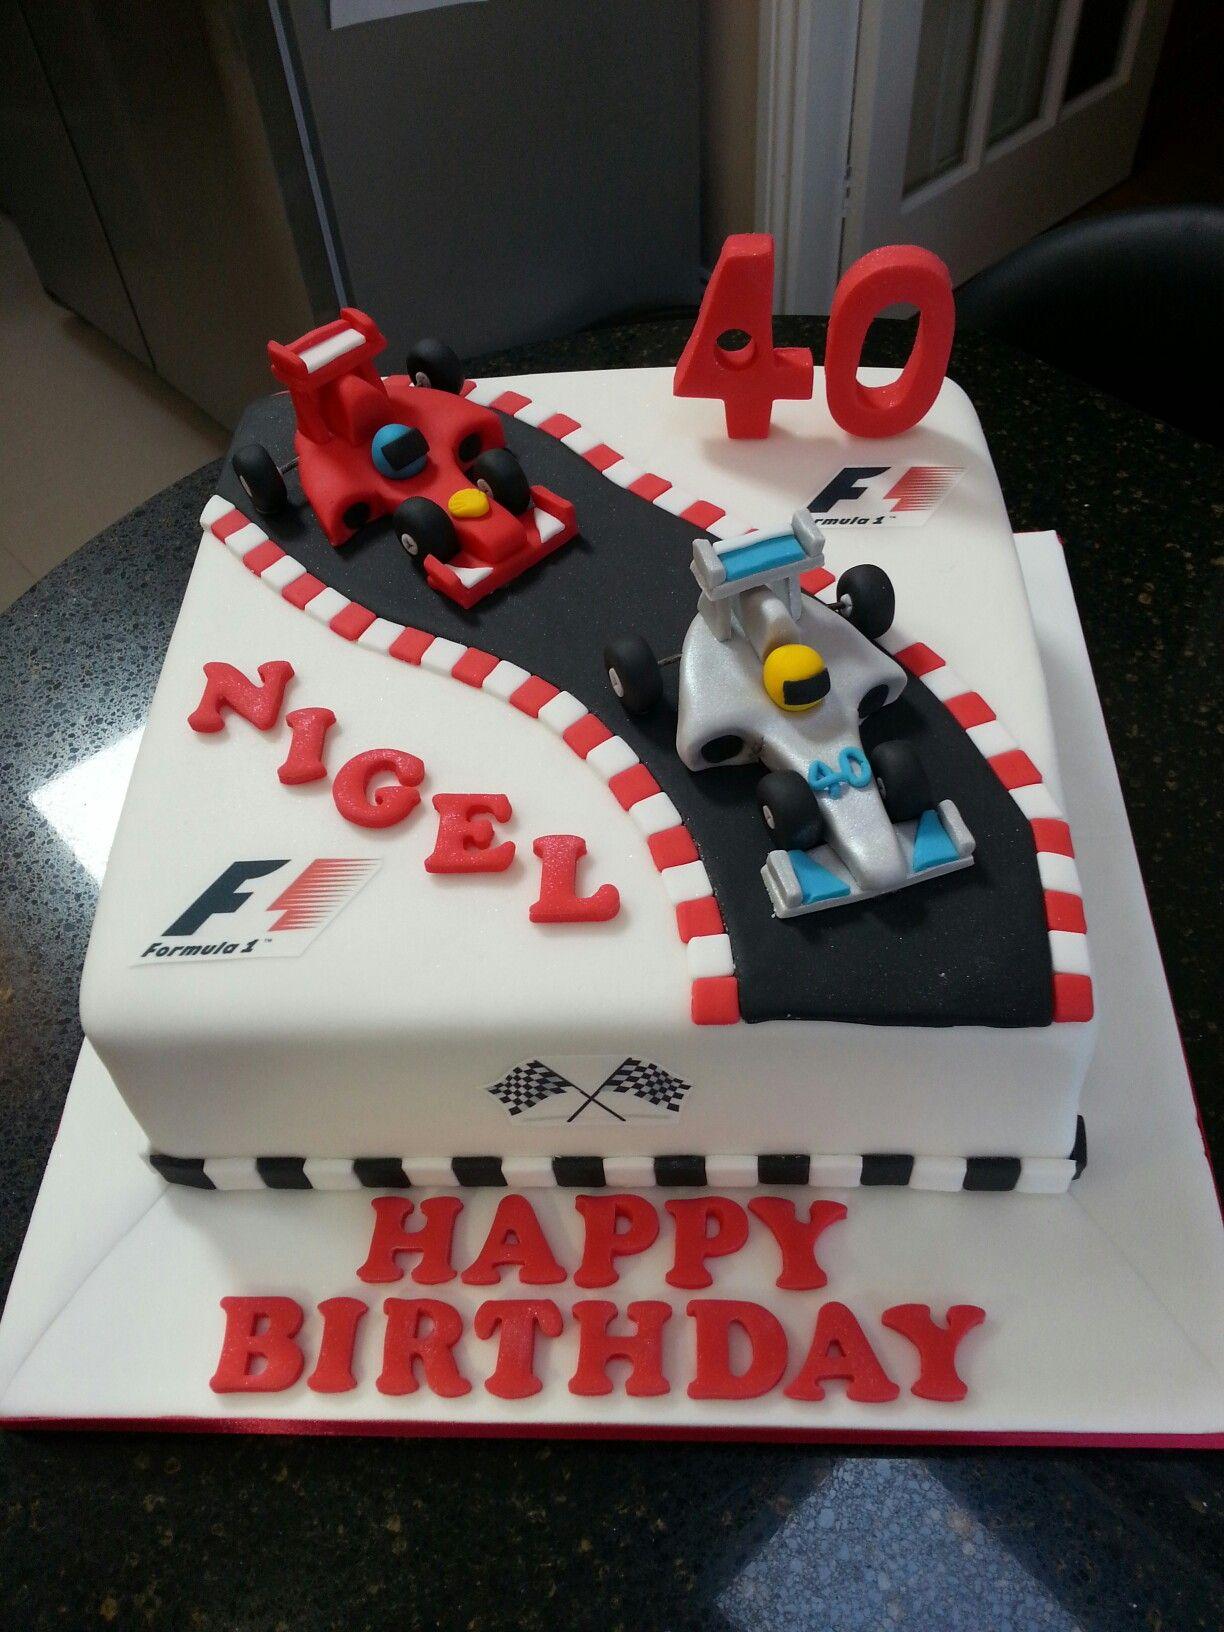 Formula One Racing Car 40th Birthday Cake